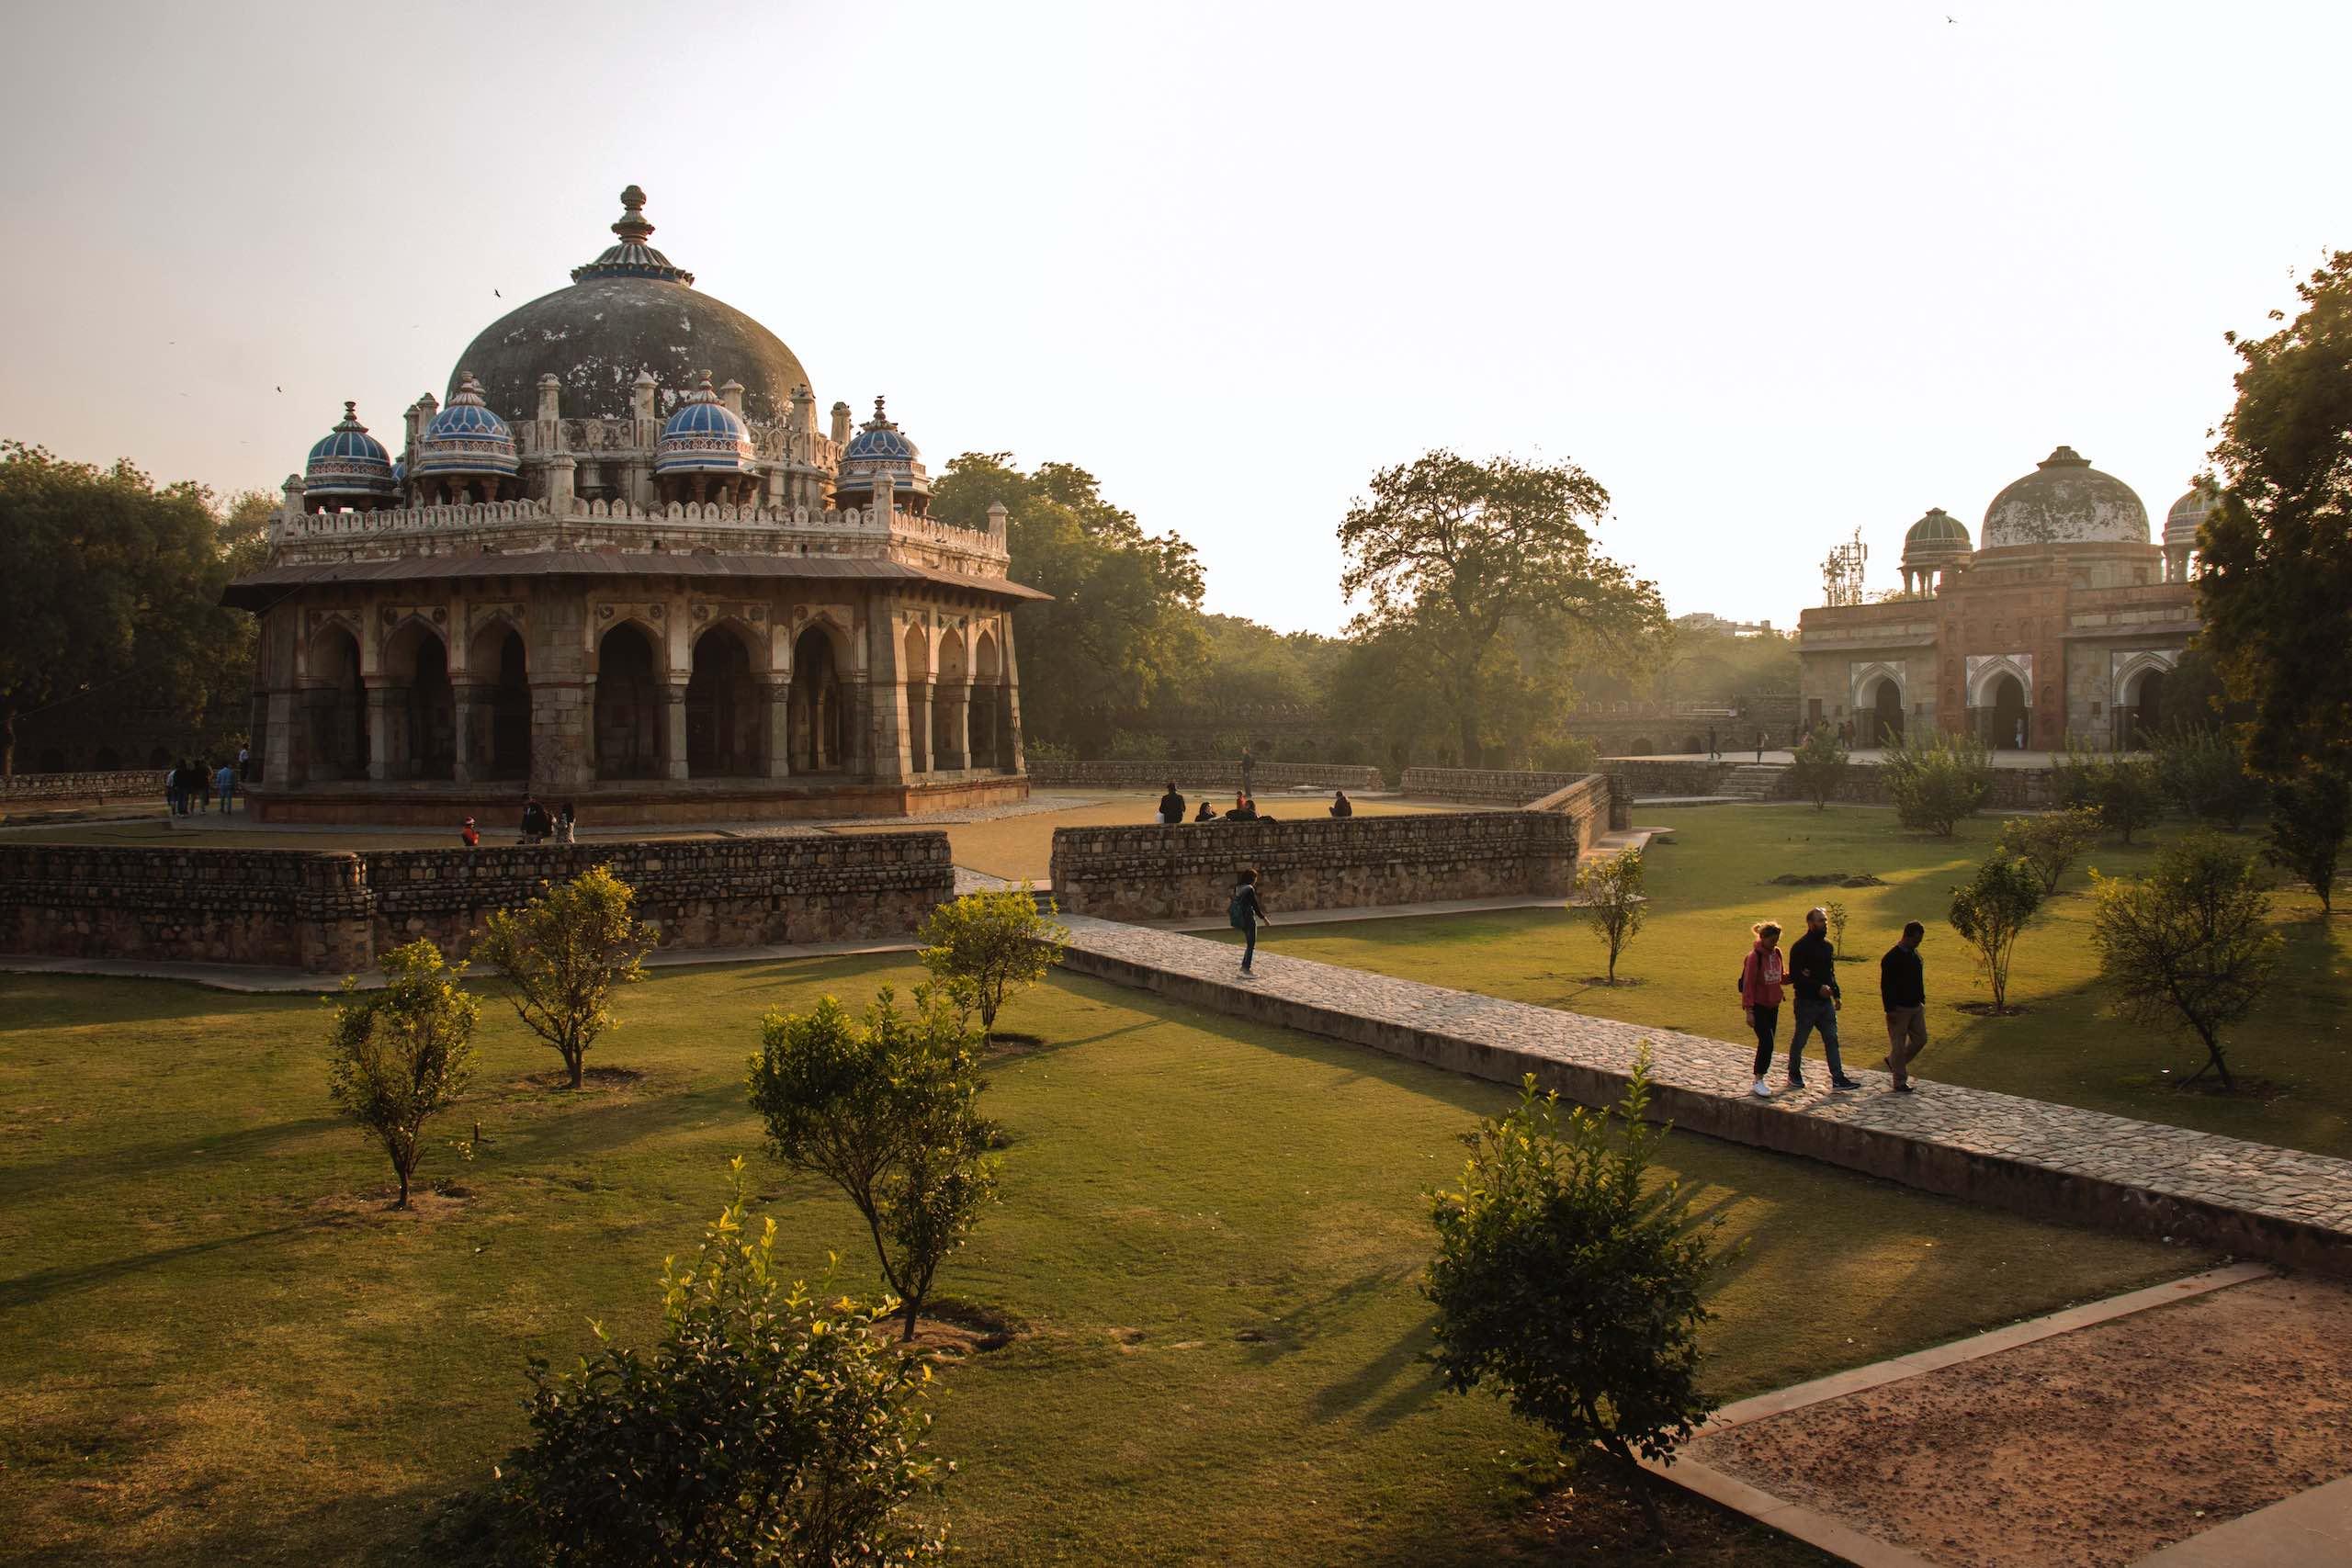 Photo: Siddhant Singh